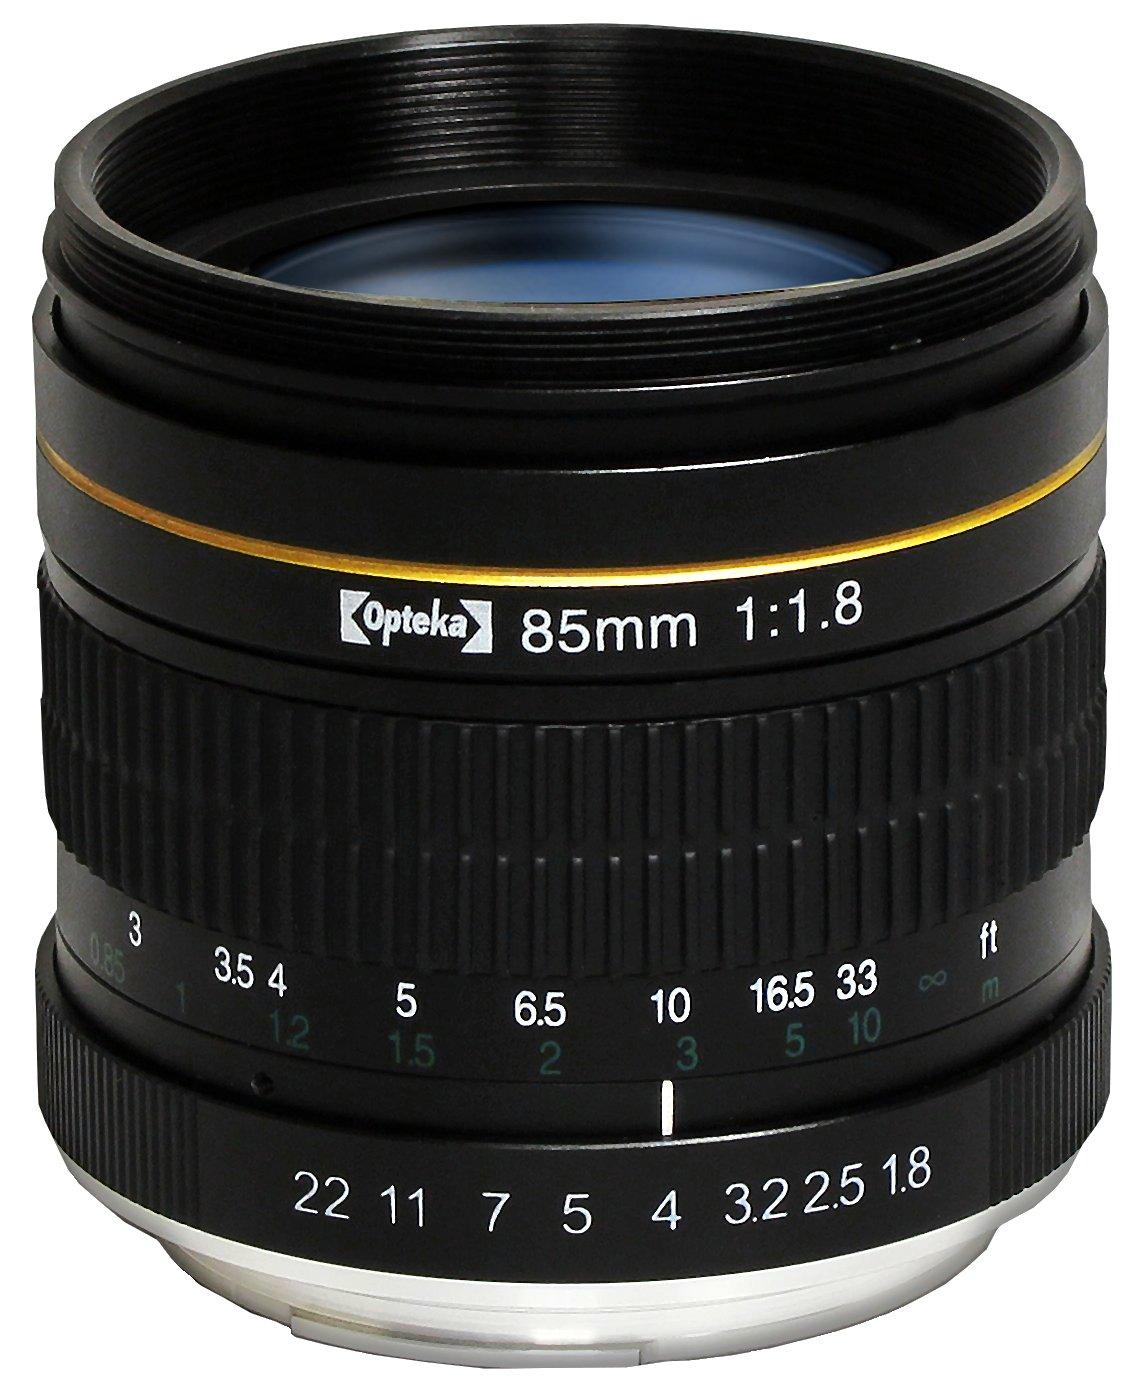 Opteka 85mm f/1.8 Manual Focus Aspherical Medium Telephoto Lens